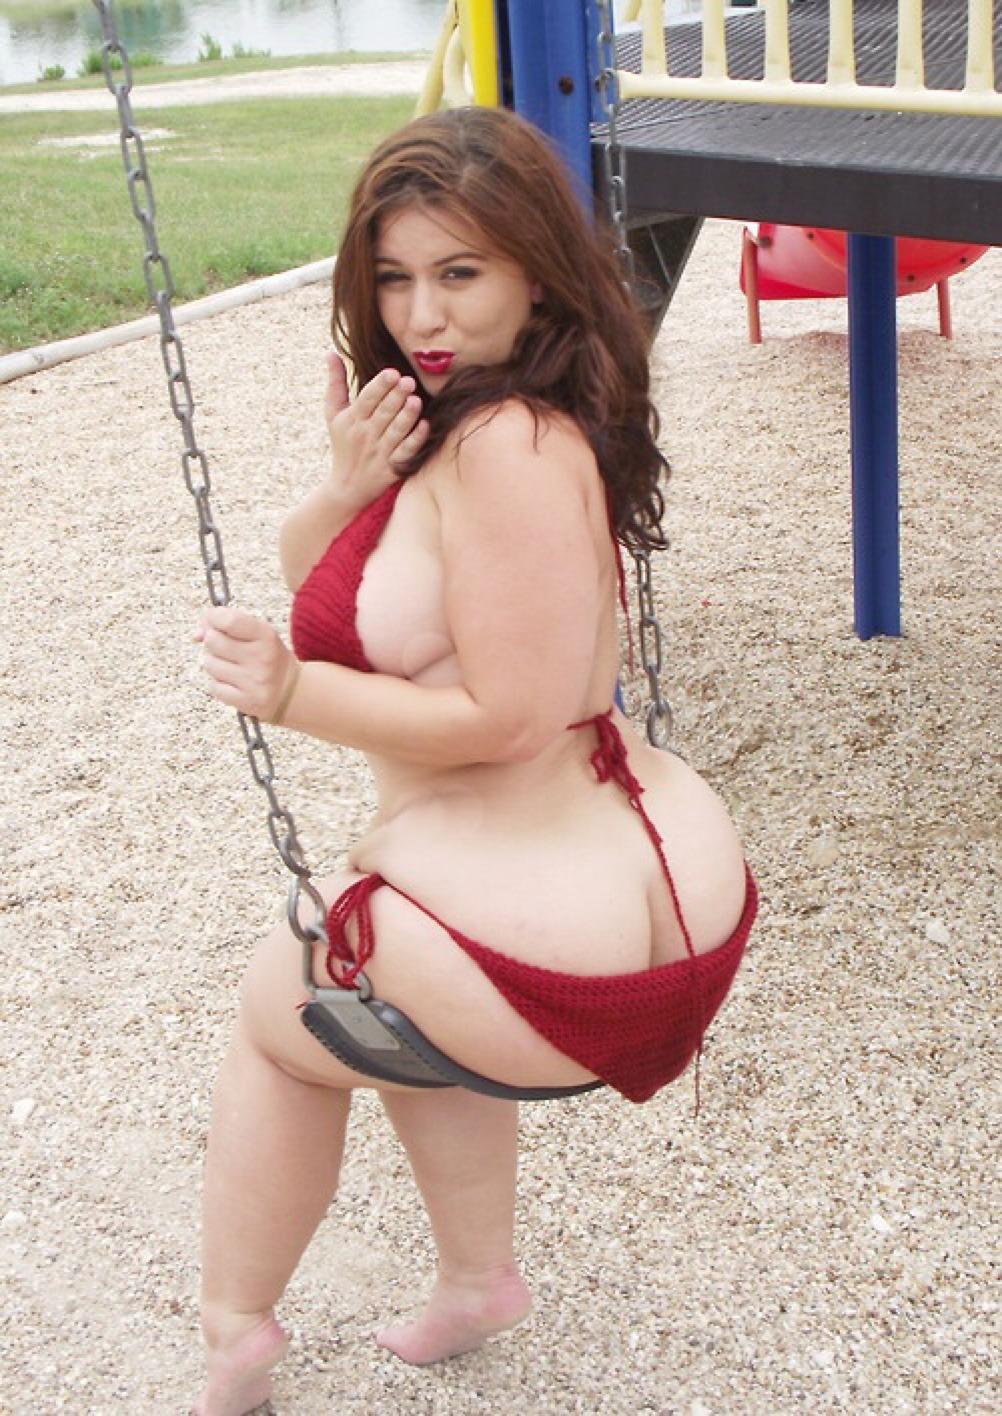 rodney moore chubby asian 3 on bigassxfuck.com